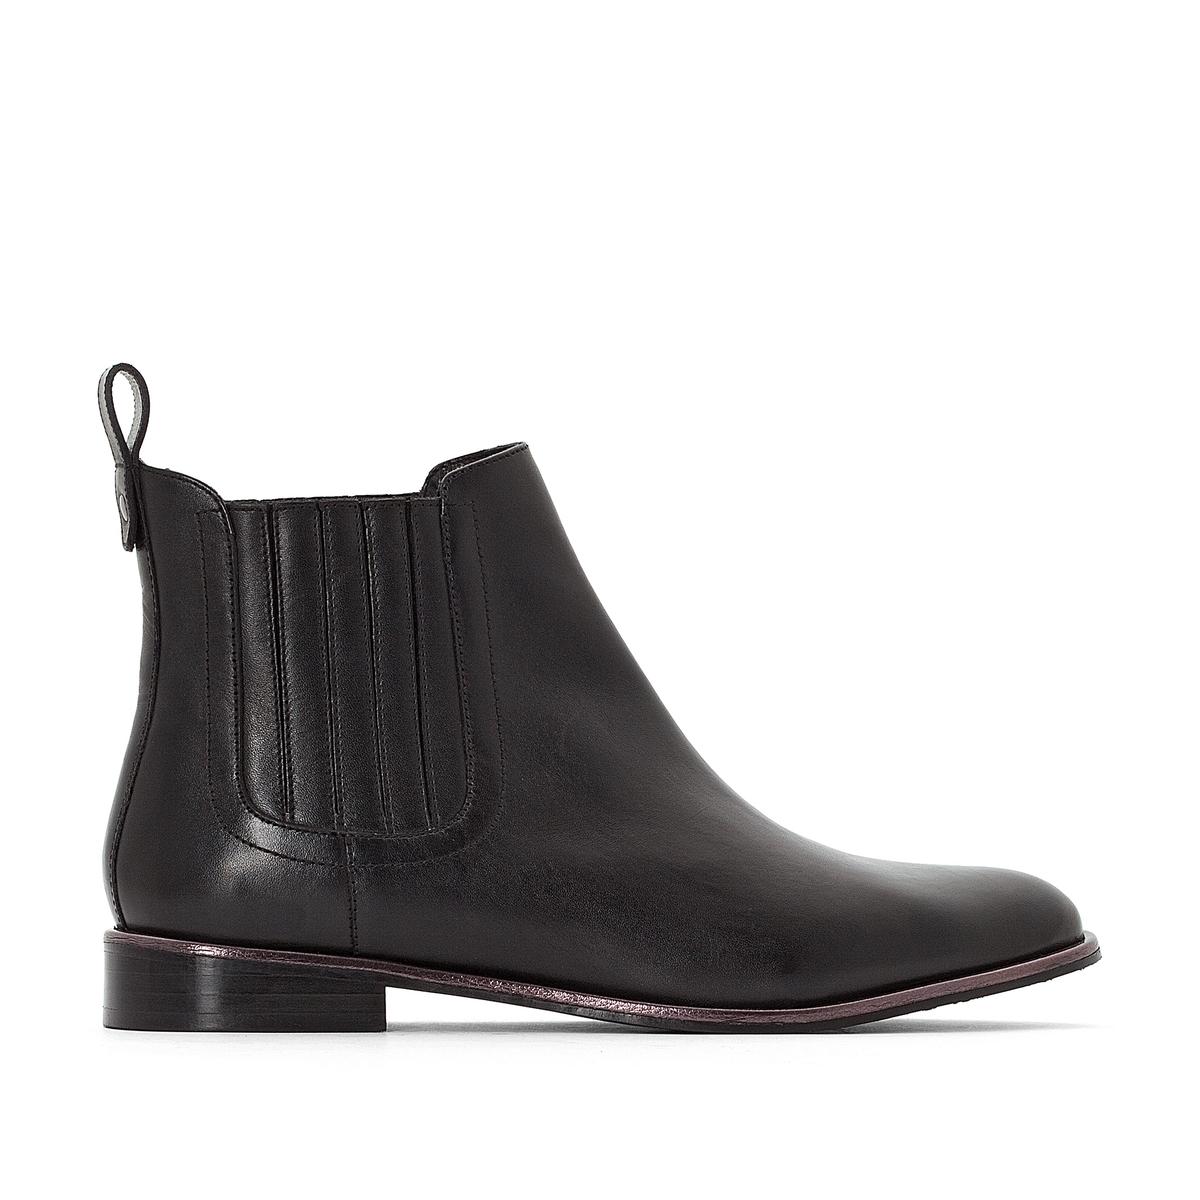 Ботинки-челси кожаные